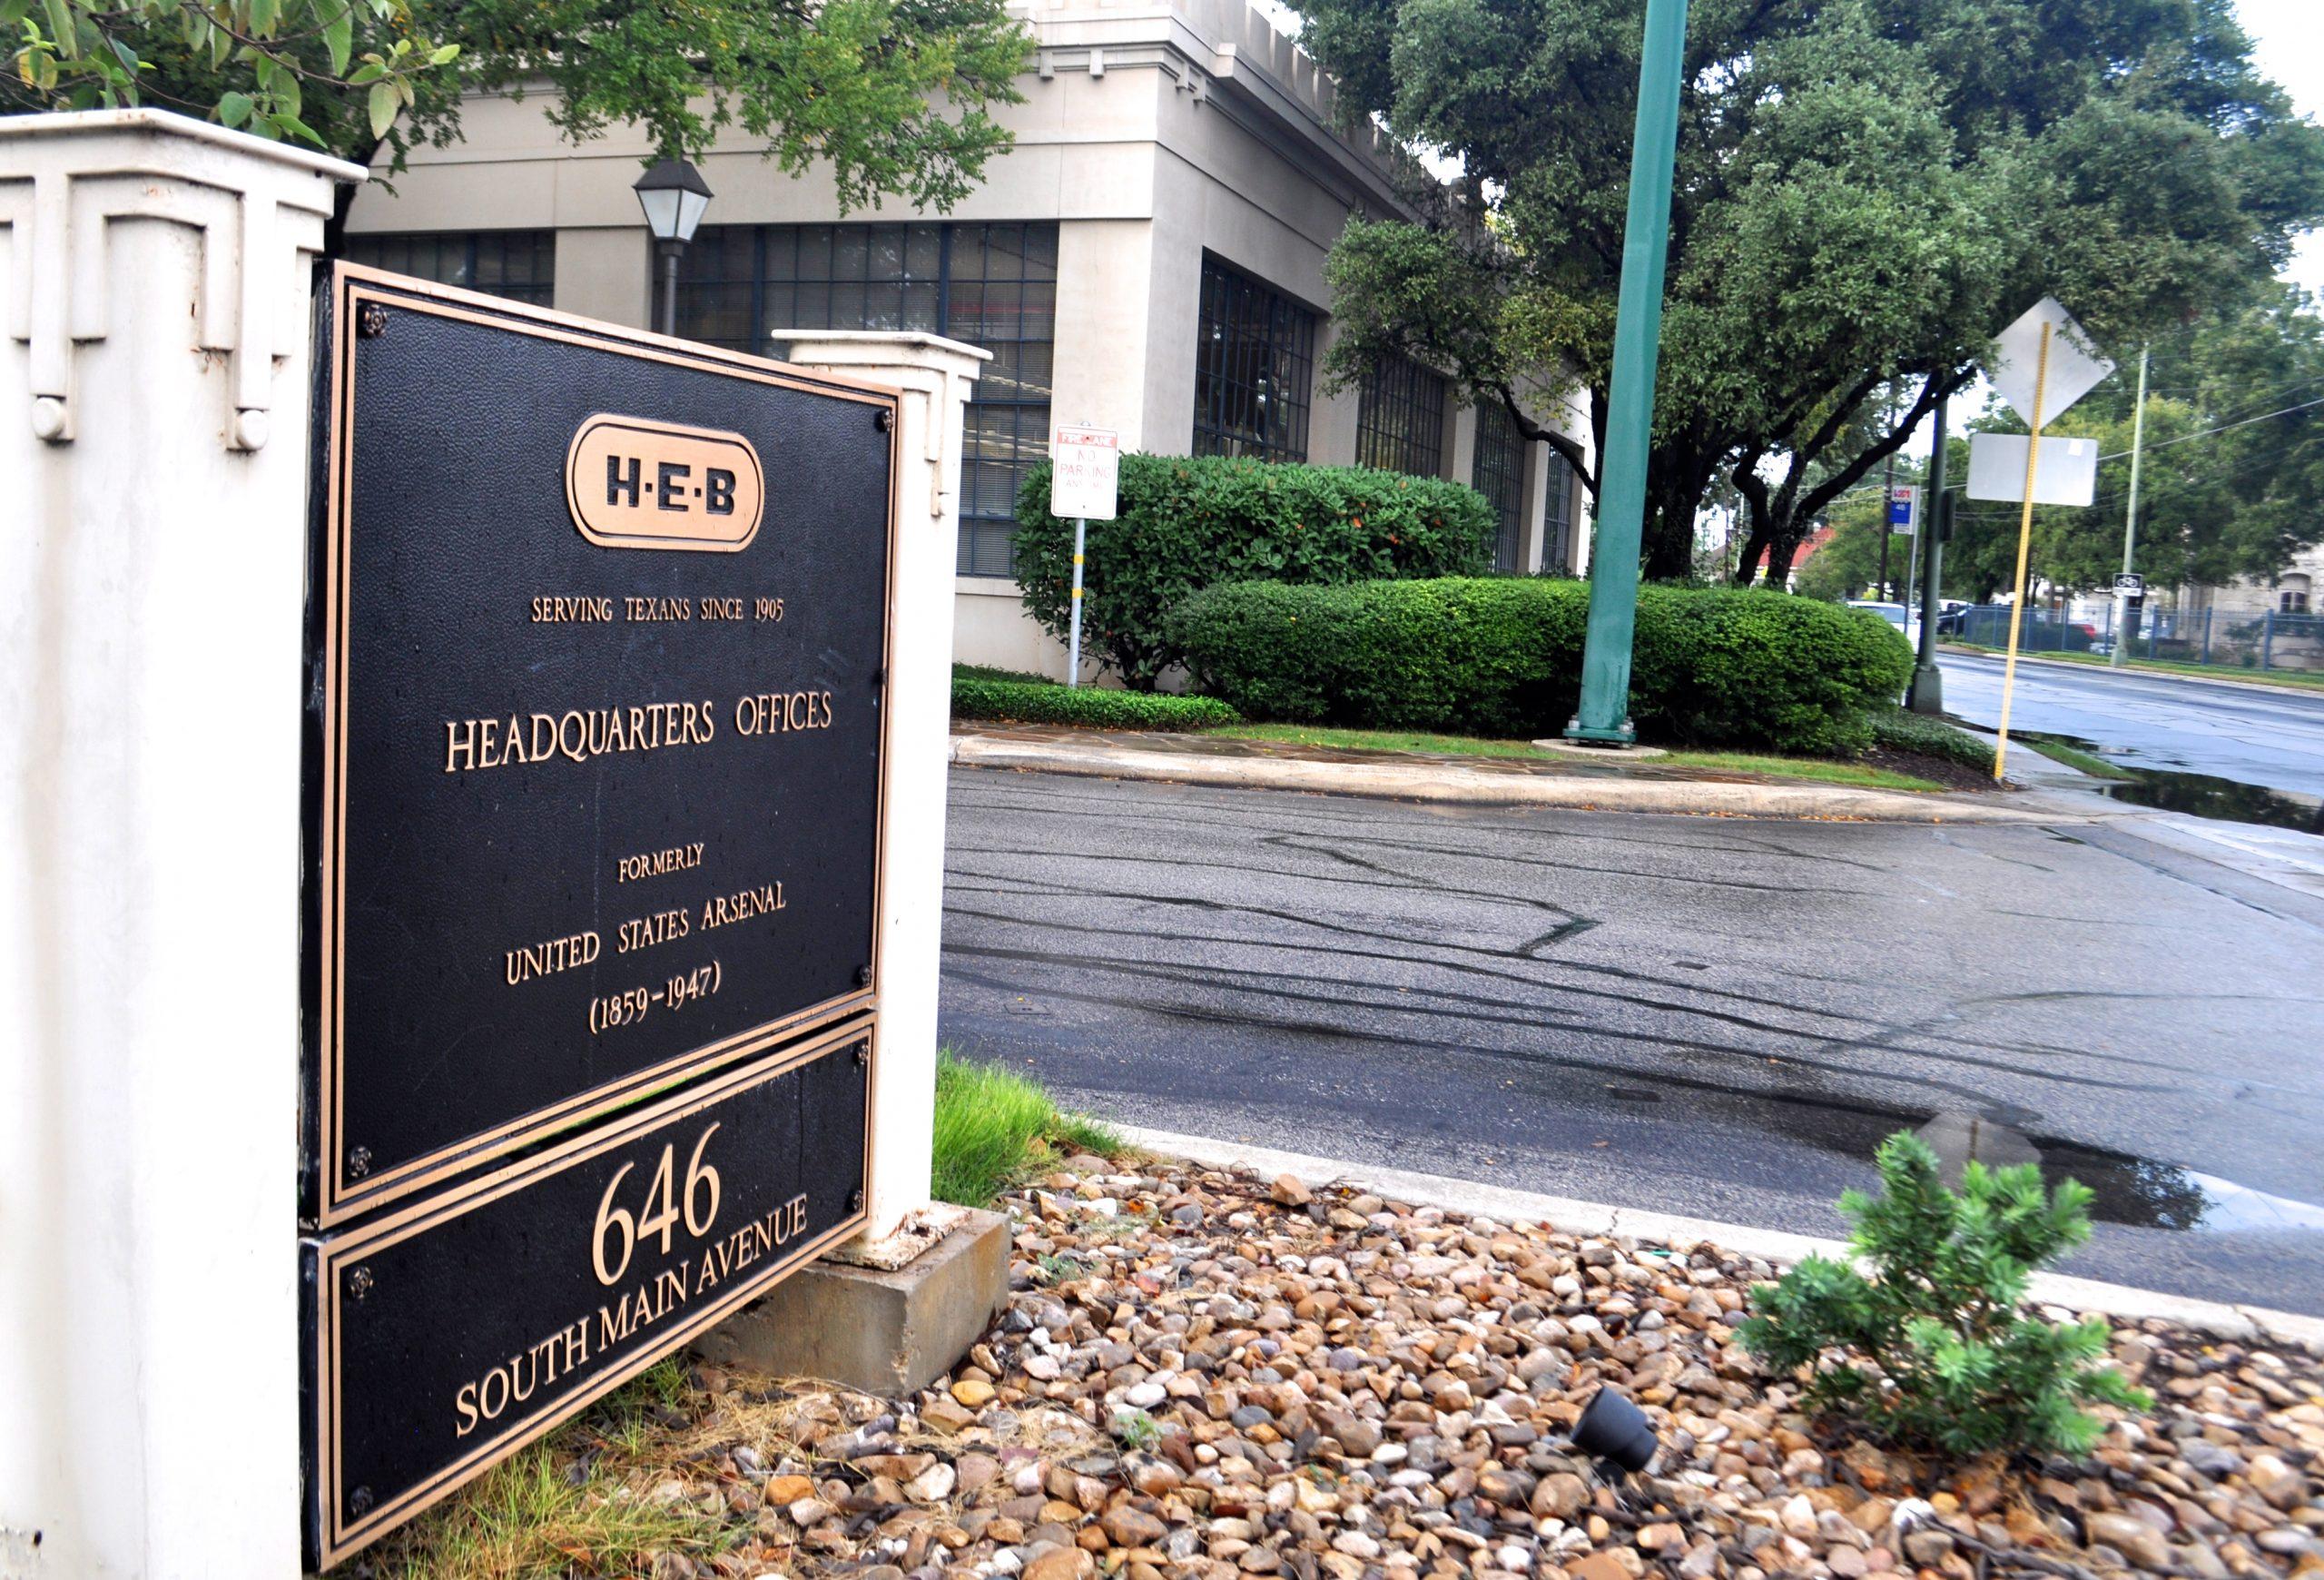 H-E-B headquarters entrance off Main Avenue. Photo by Iris Dimmick.